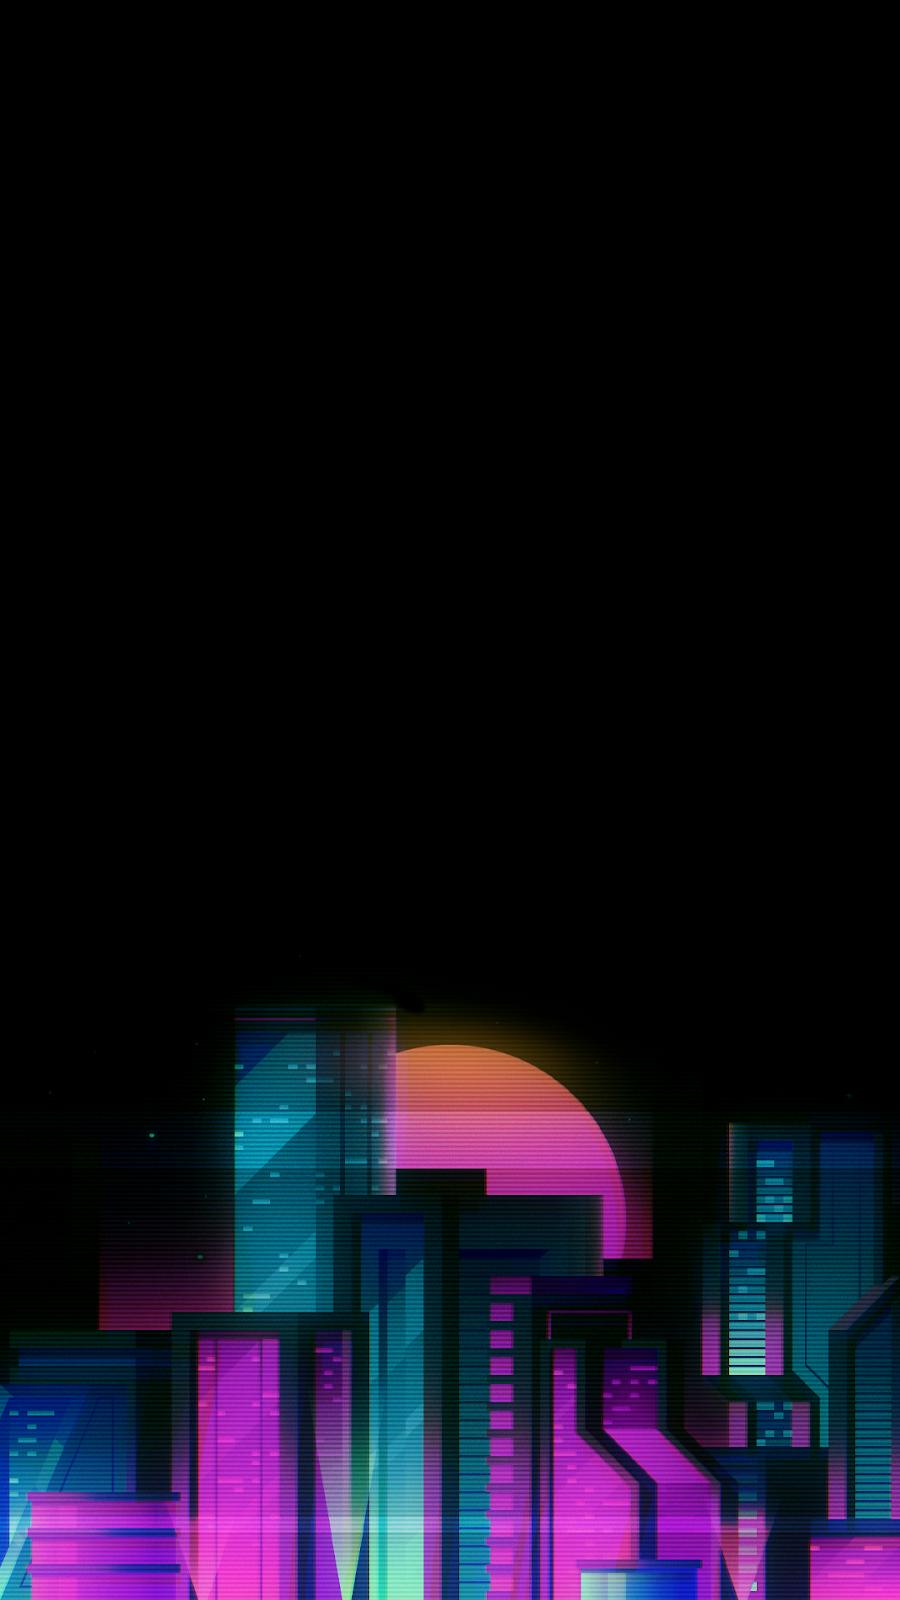 cityscape oled cyberpunk